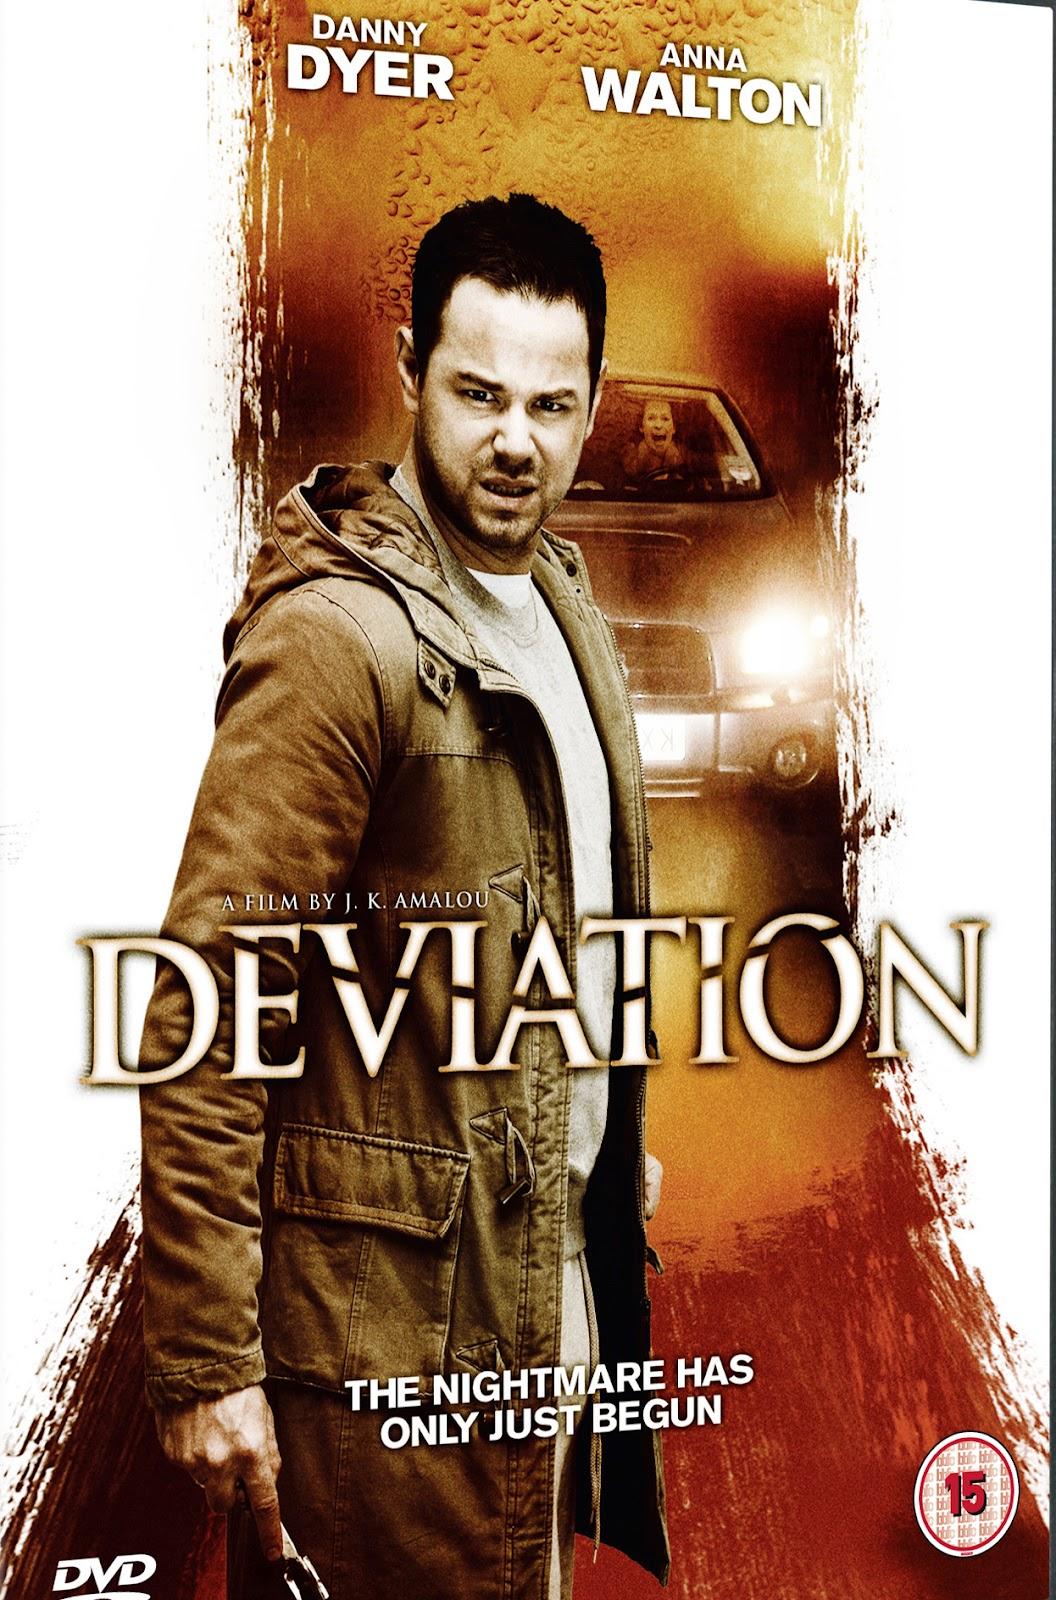 Deviation (2012) DVDRip 350MB